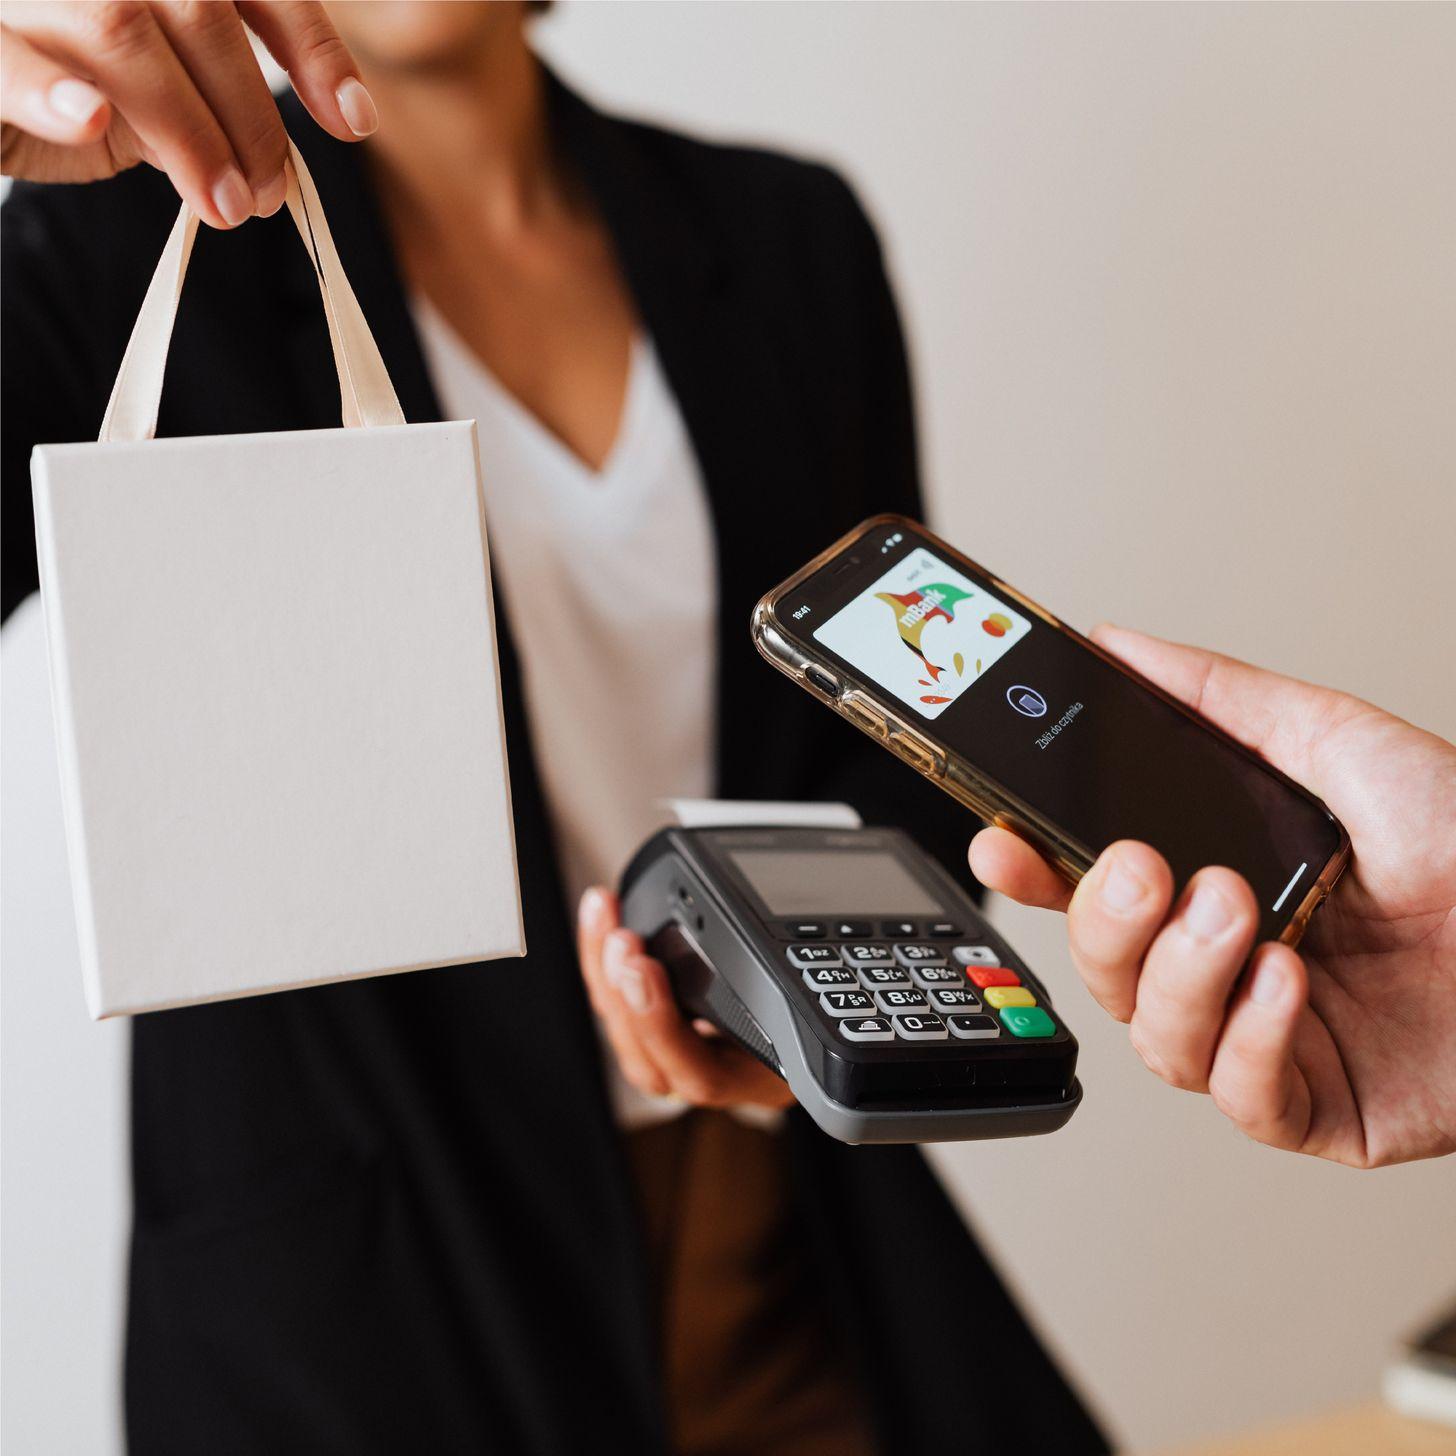 shopping_mobile_pos.jpg